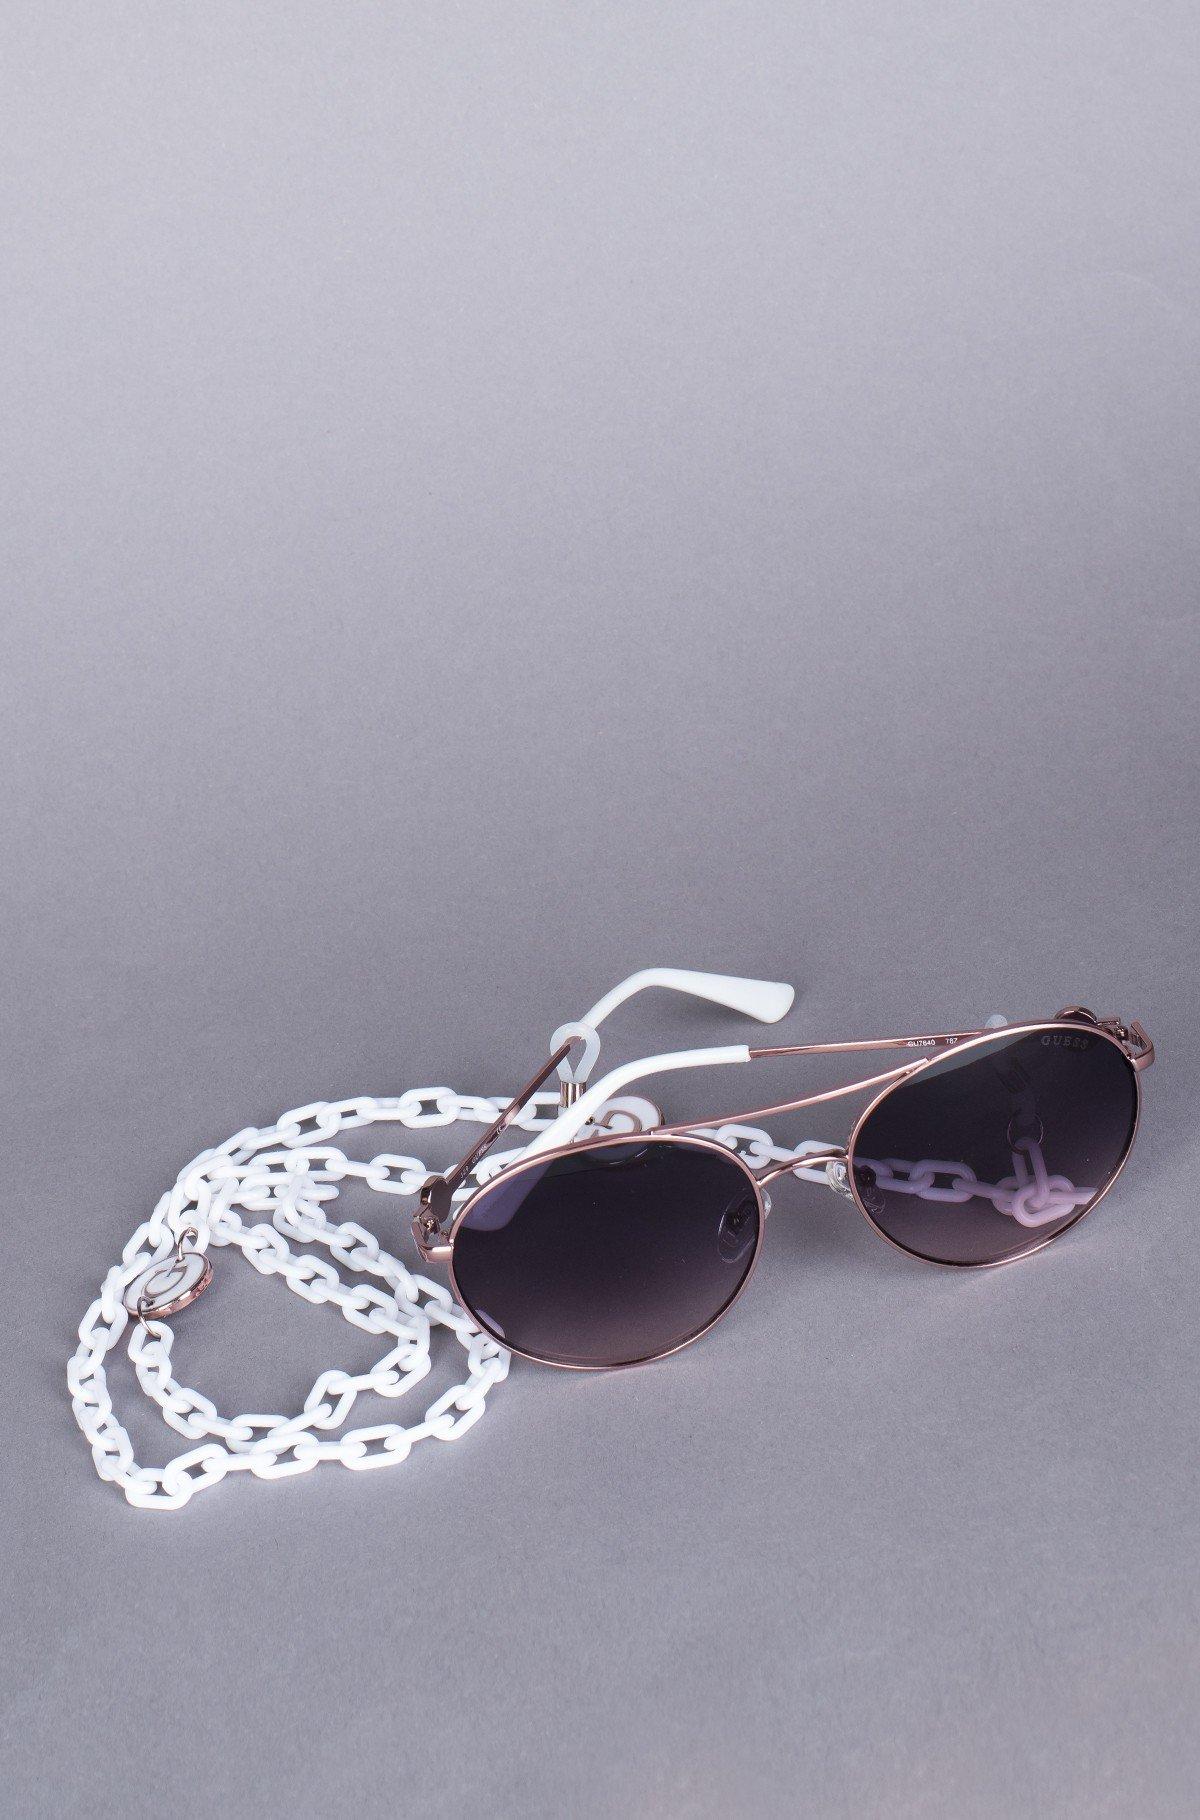 Sunglasses 7640-full-2